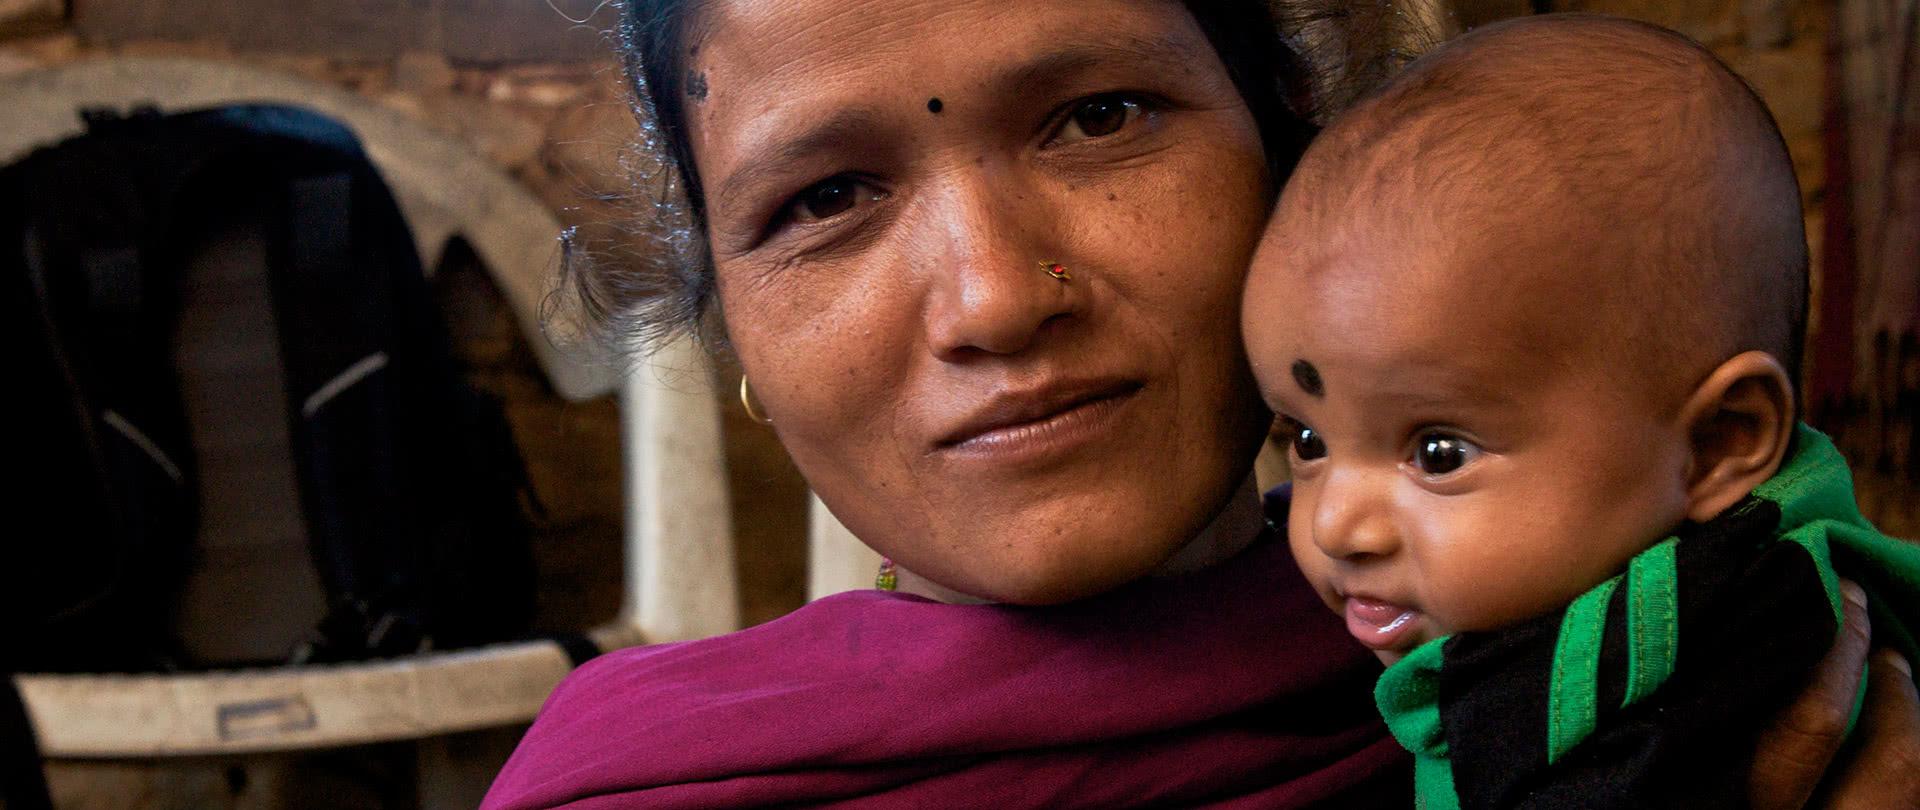 nepal-earthquake-1920-thank-you